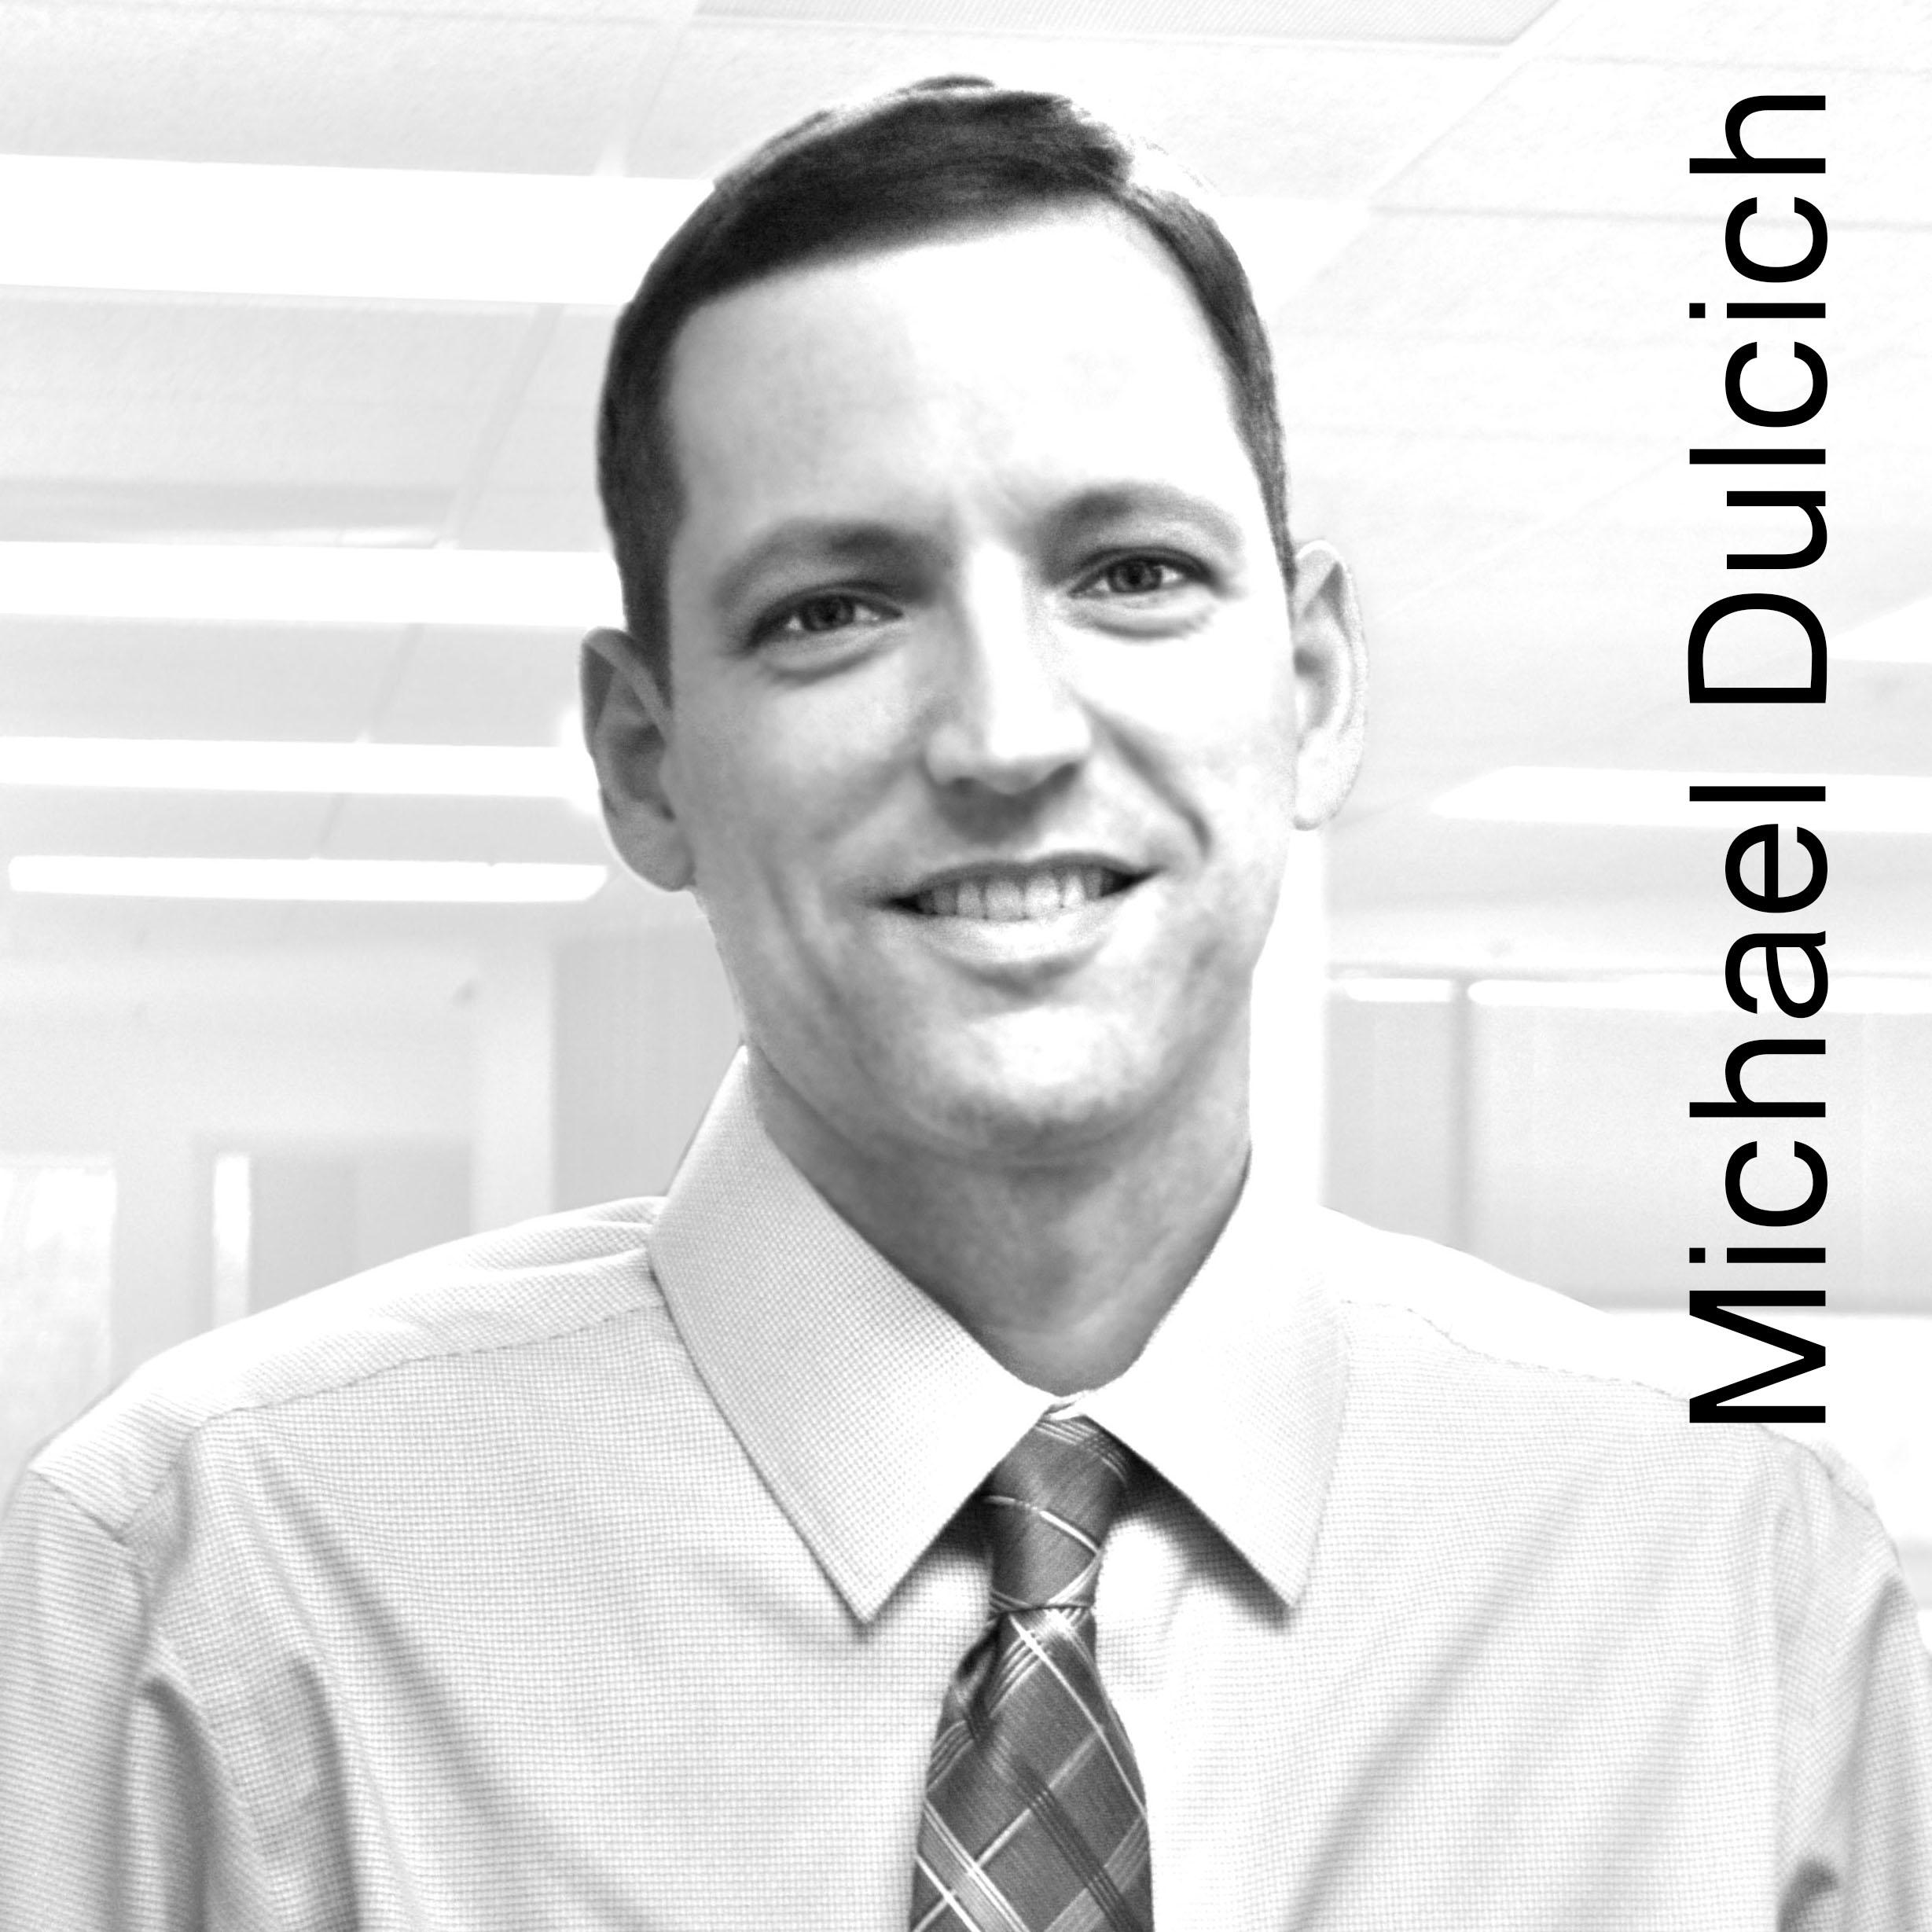 michael_dulcich_square_copy3.jpg